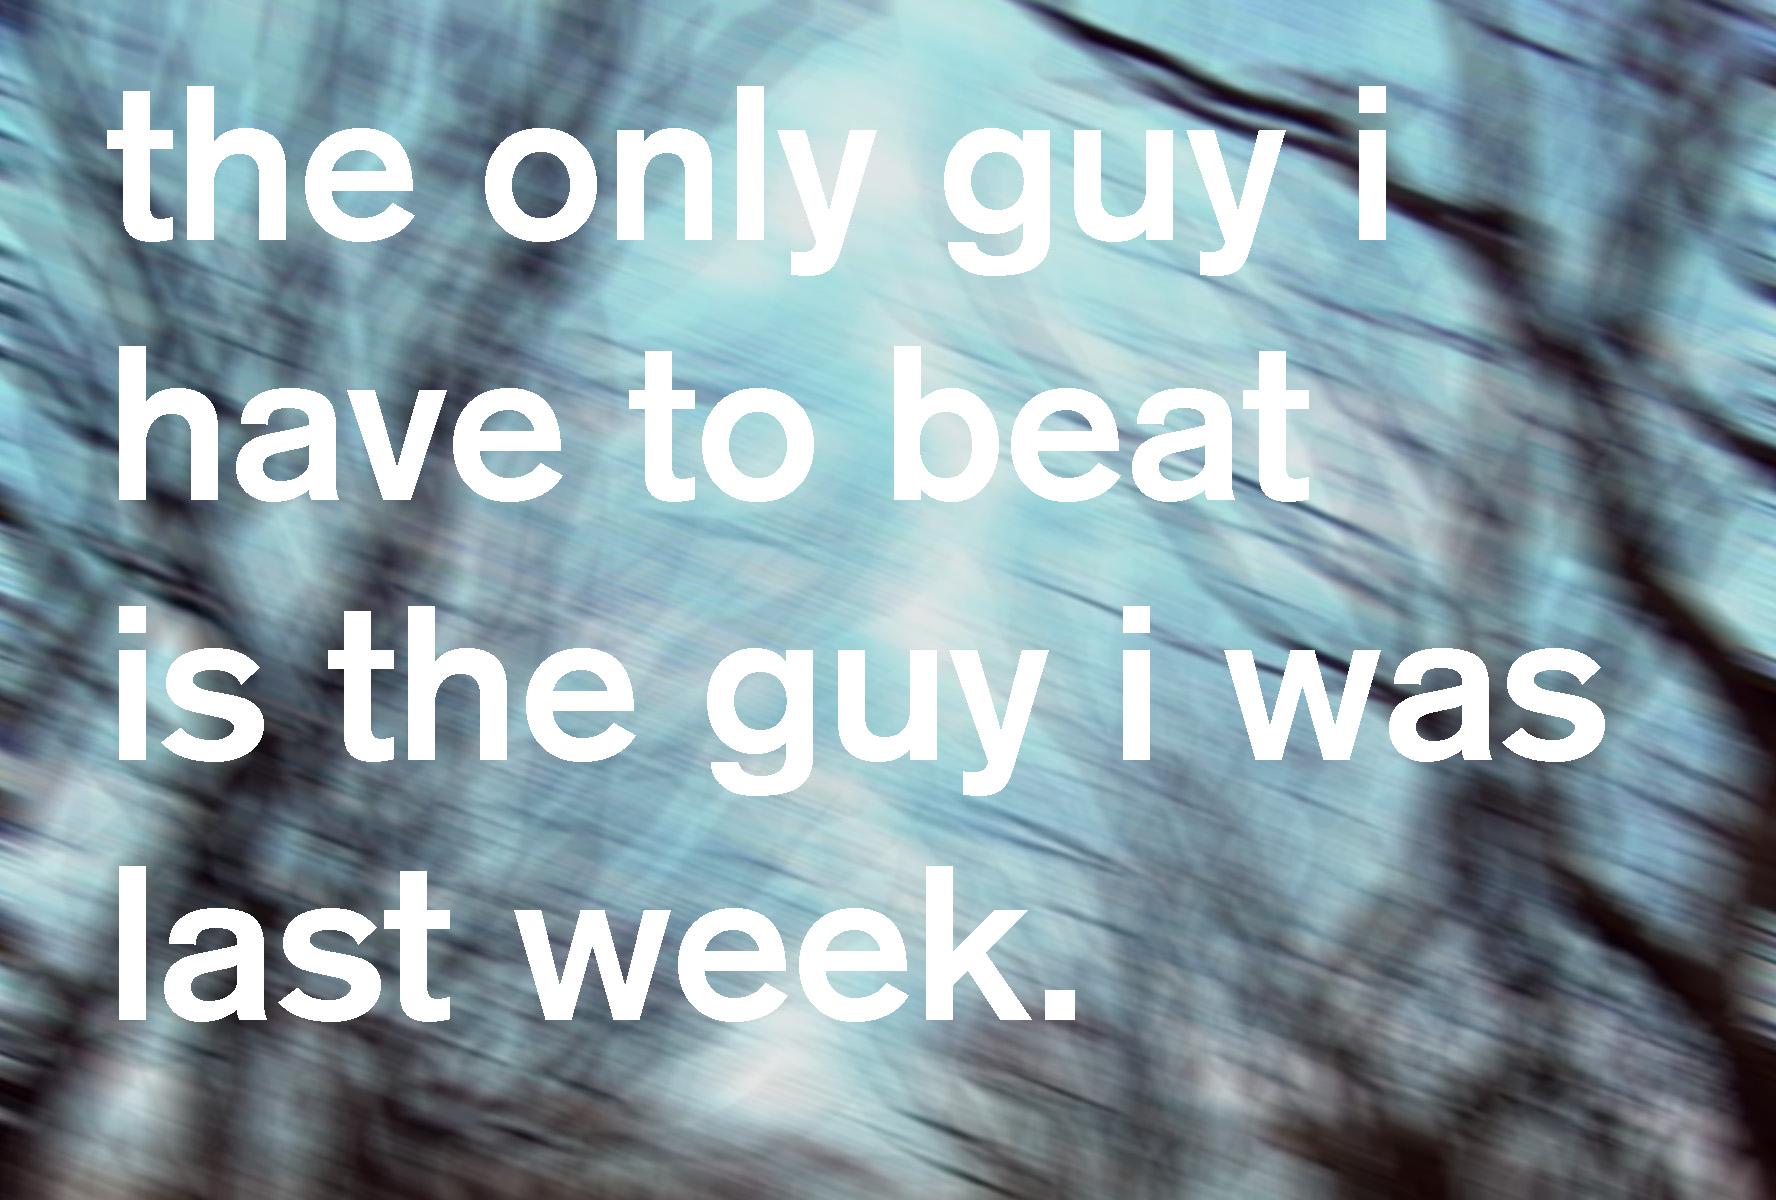 Inspirational Quotes Motivation Goals